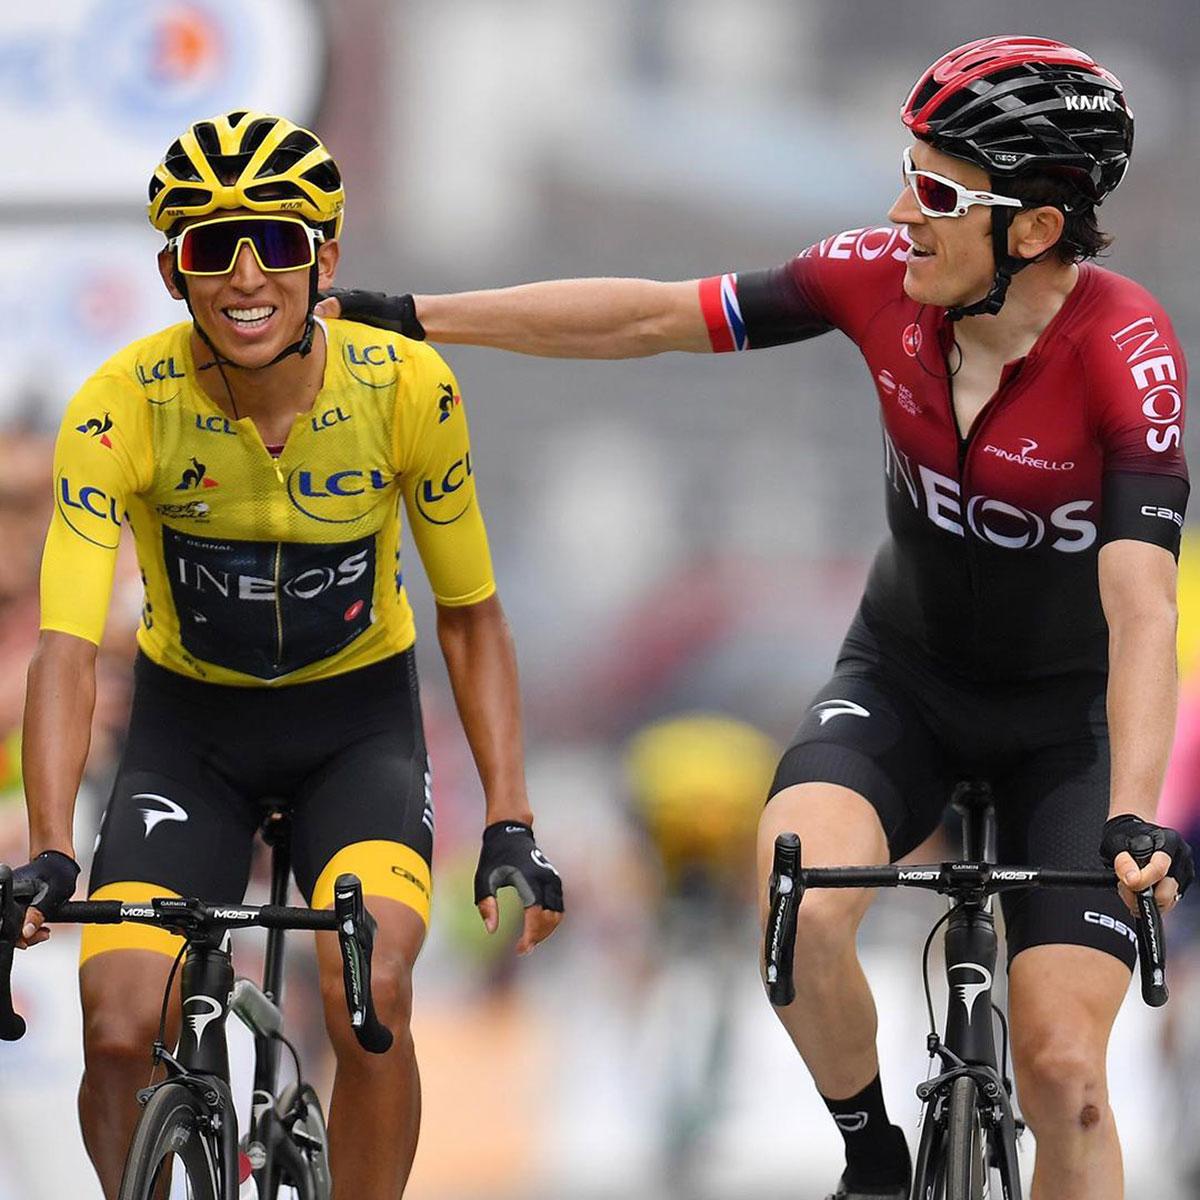 Bernal e Thomas al Tour de France 2019